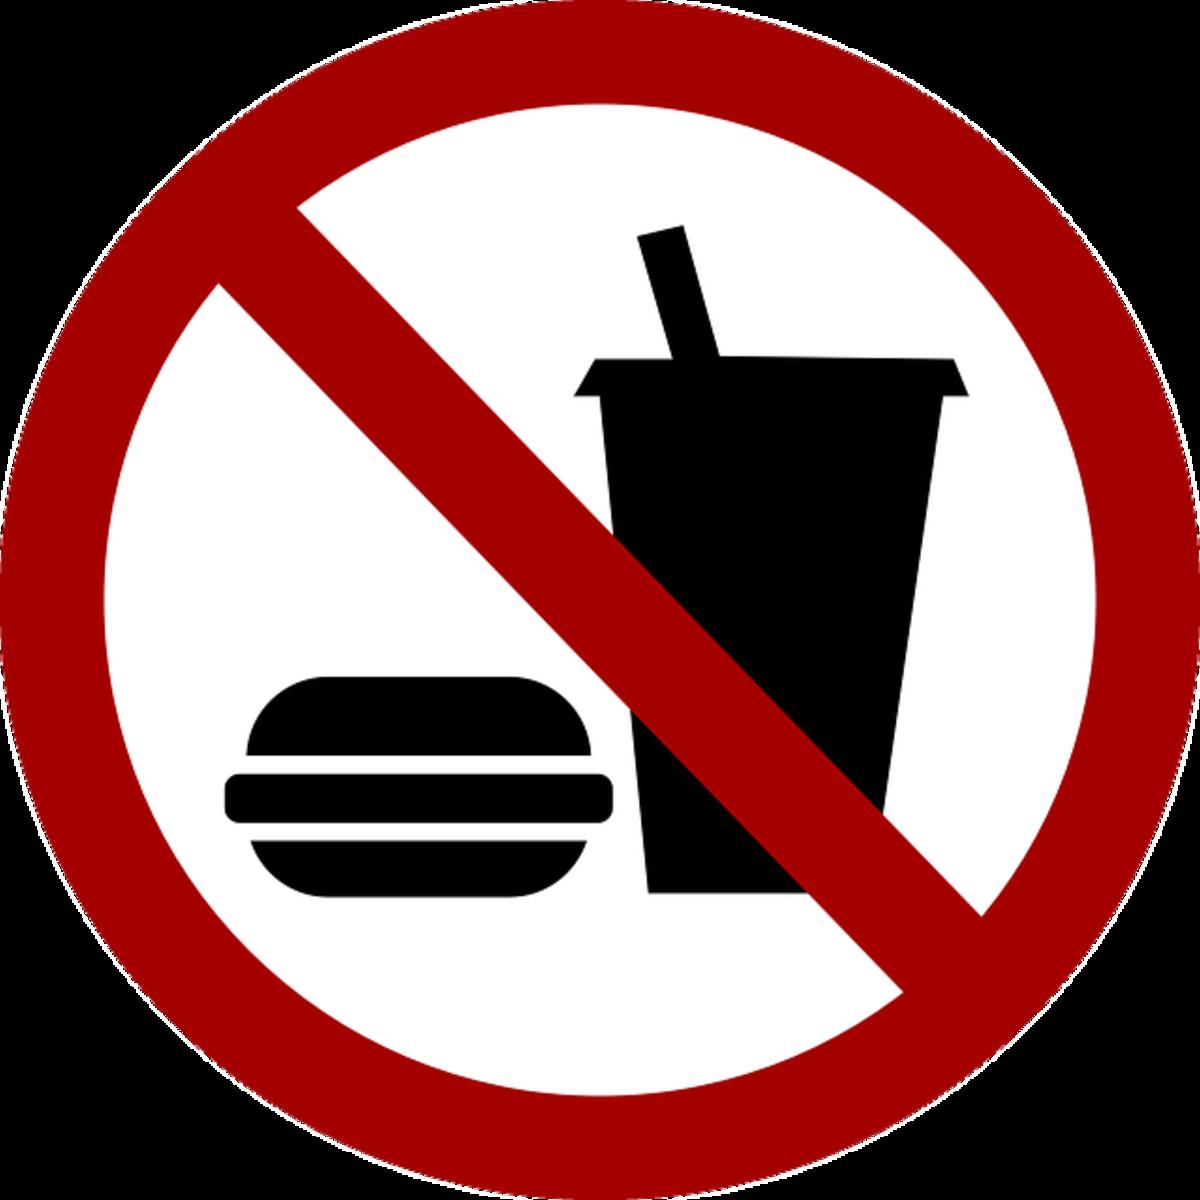 No fatty foods - eat healthy